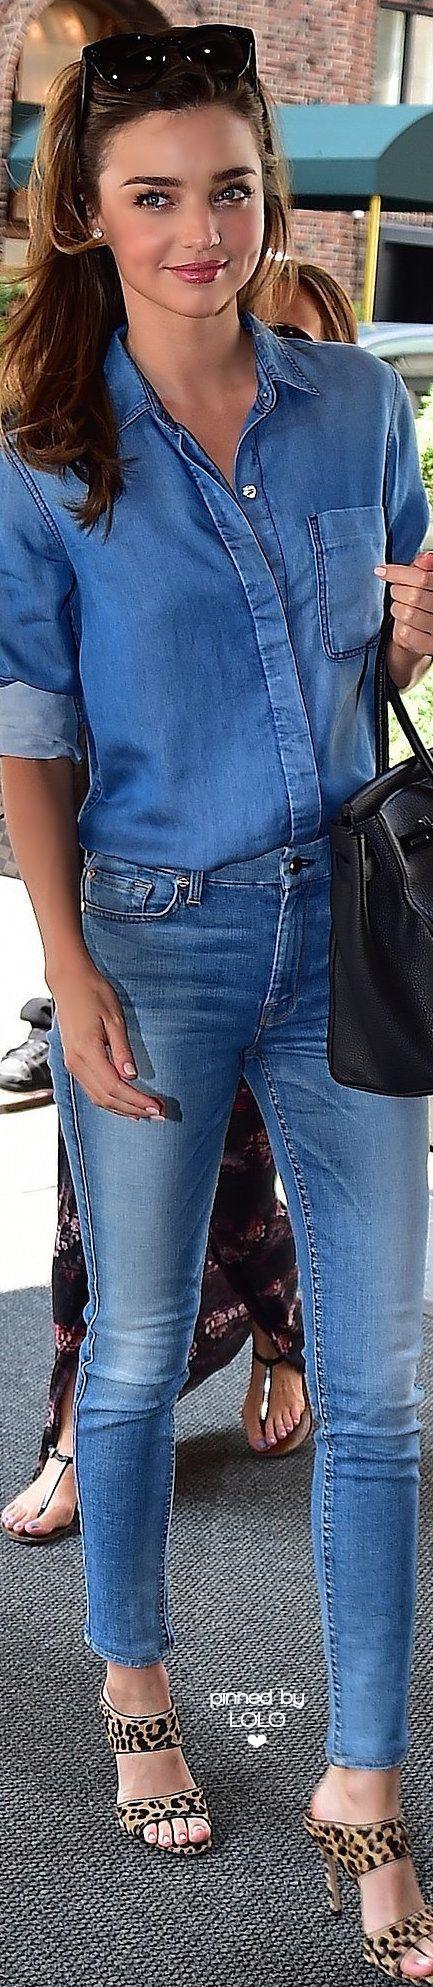 miranda kerr 39 s lessons in hot double denim australien jeans mit jeans und make up. Black Bedroom Furniture Sets. Home Design Ideas